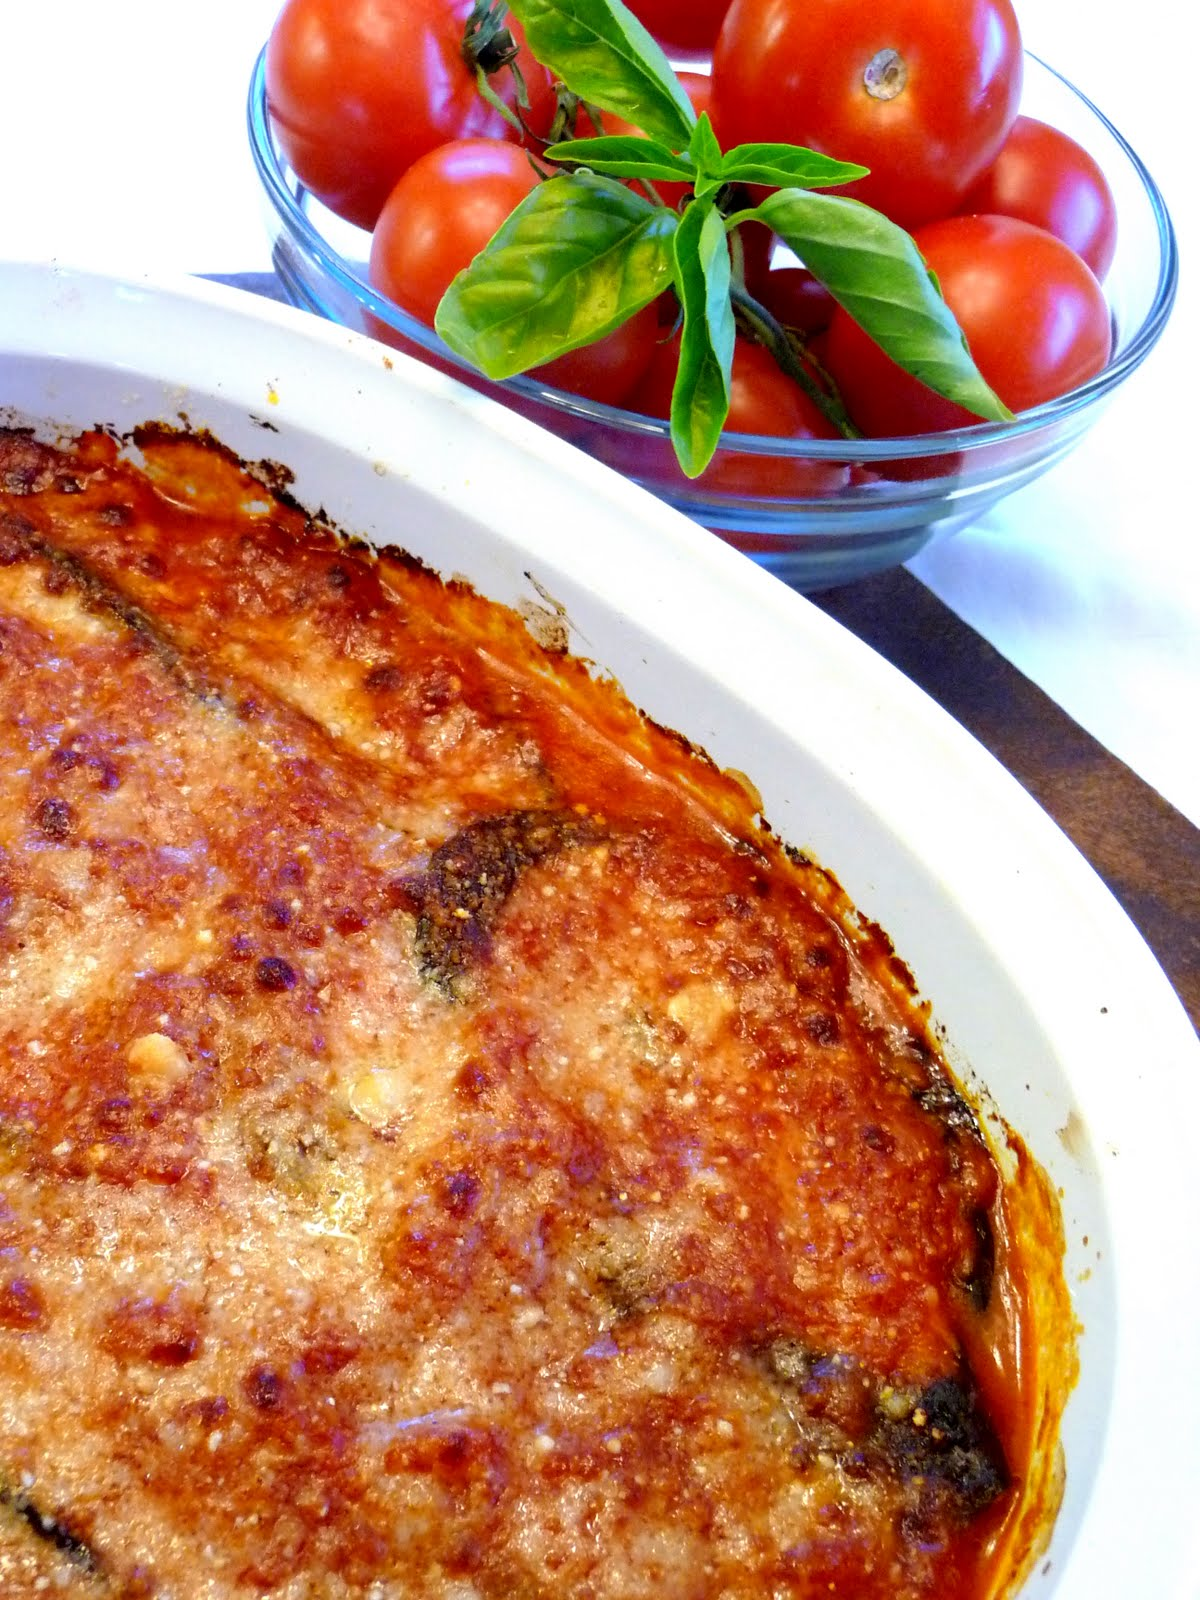 f7bcc99beae8 6 Benefits of Homemade Meals + 7 Recipes